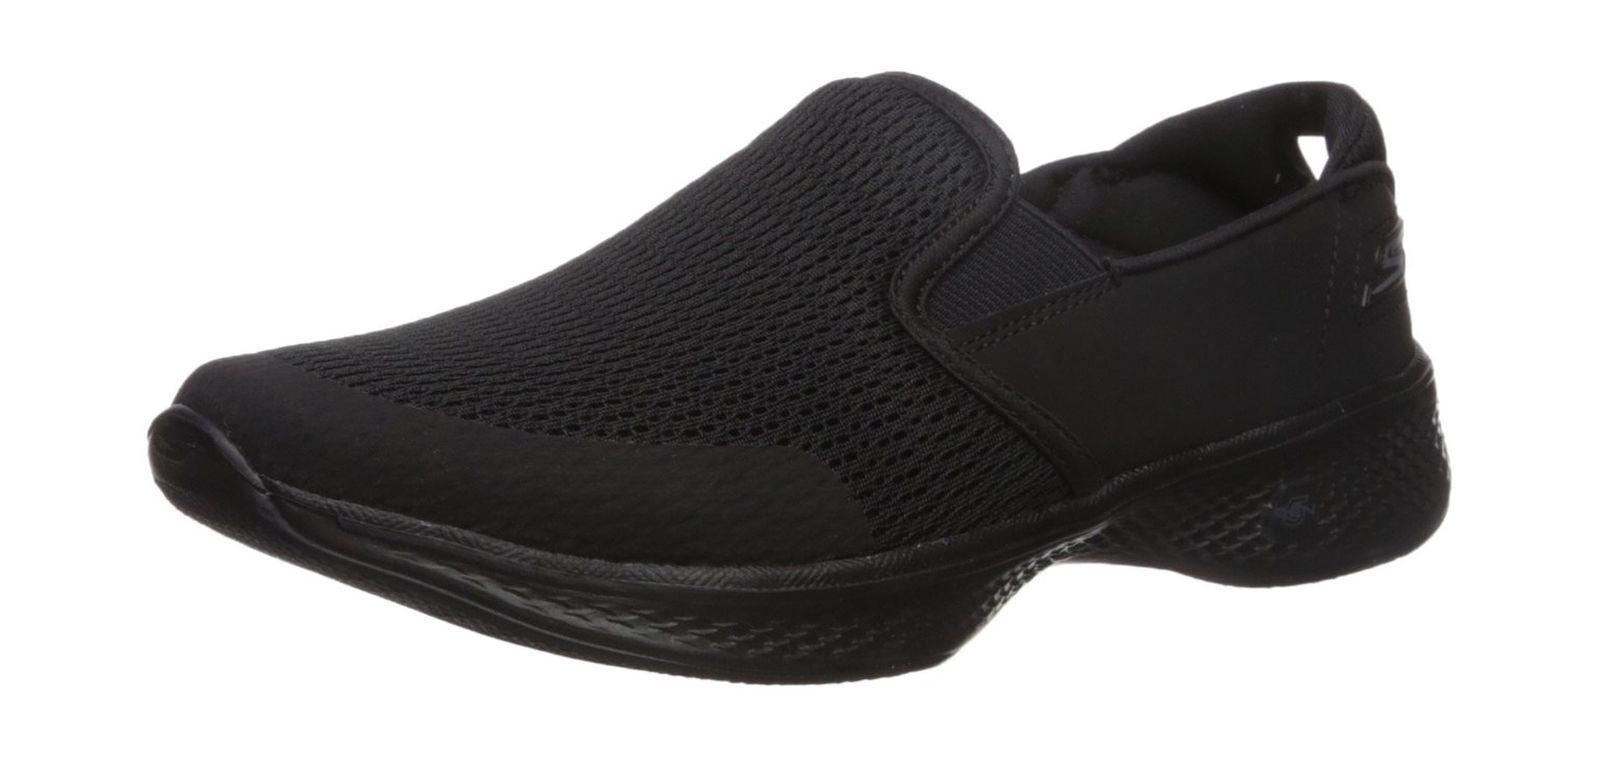 chaussures SKECHERS femmes RAGAZZA PERFORMANCE GO WALK 4 14927 noir BBK ATTUNED NEW